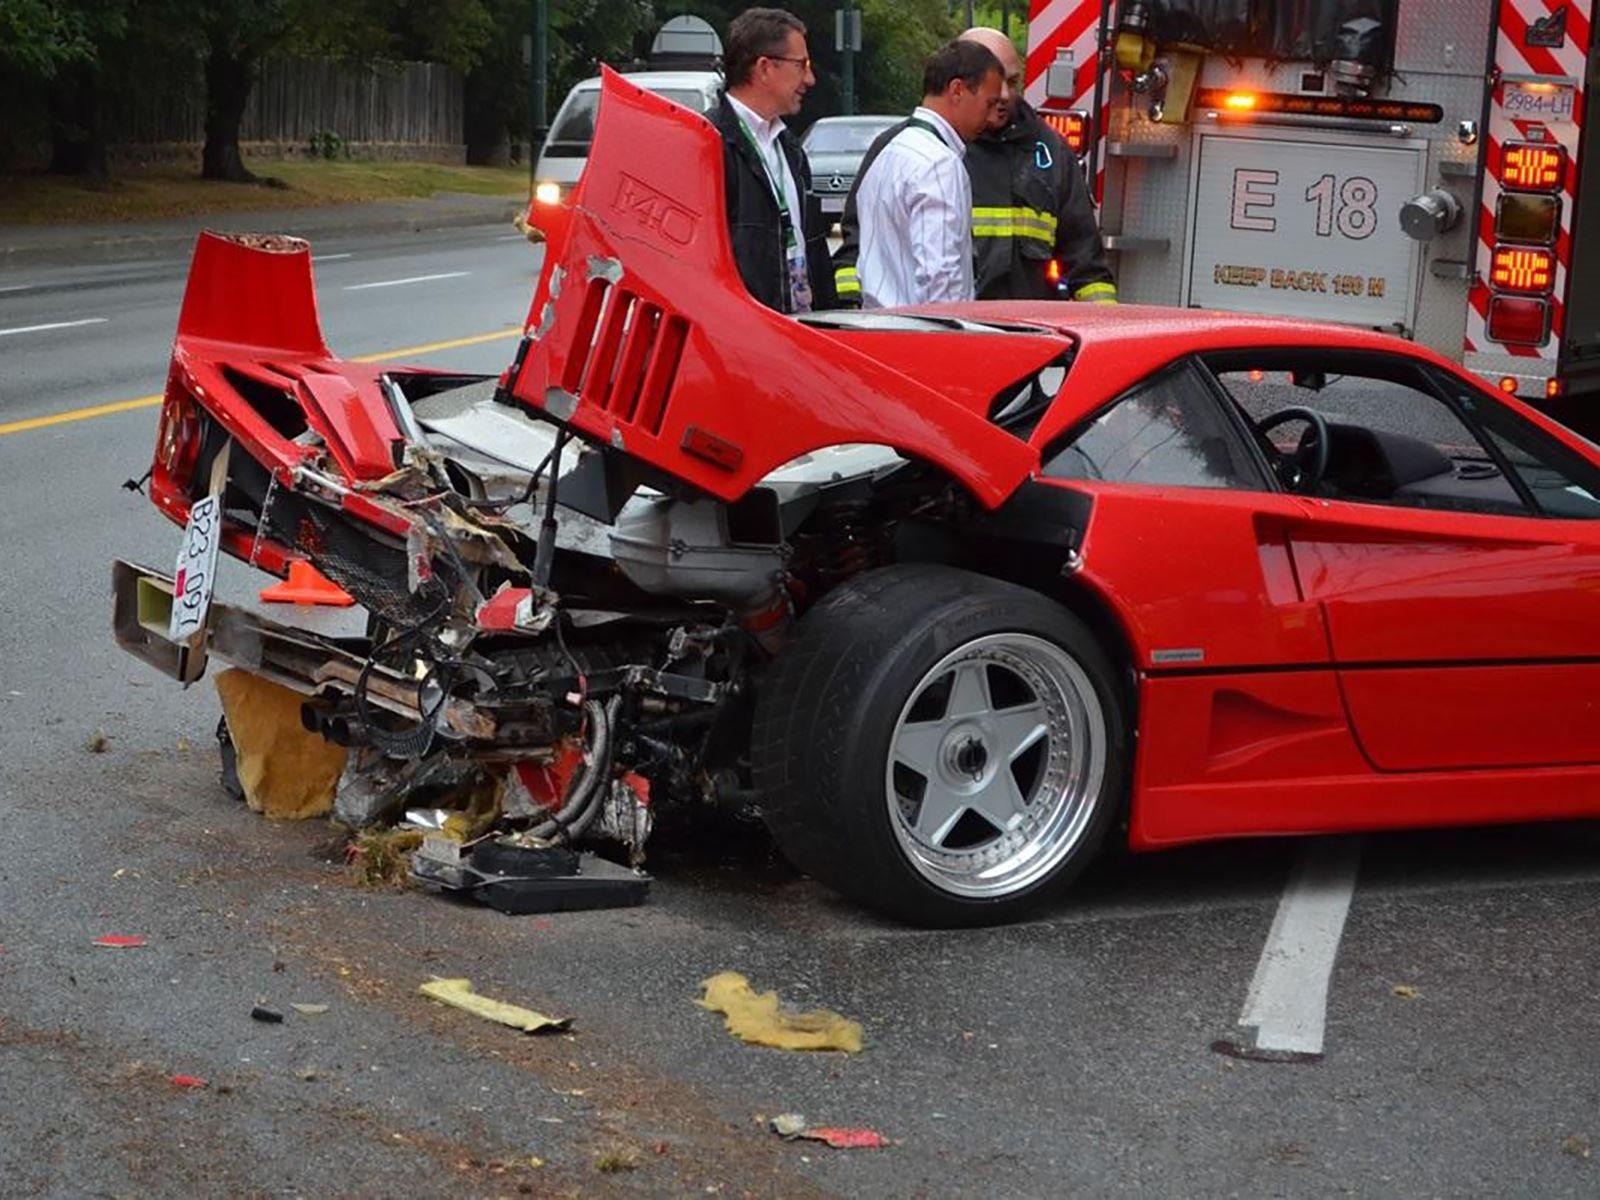 Ferrari F40 Owner Sues Insurer For Not Covering 1 Million Repair Cost Carbuzz